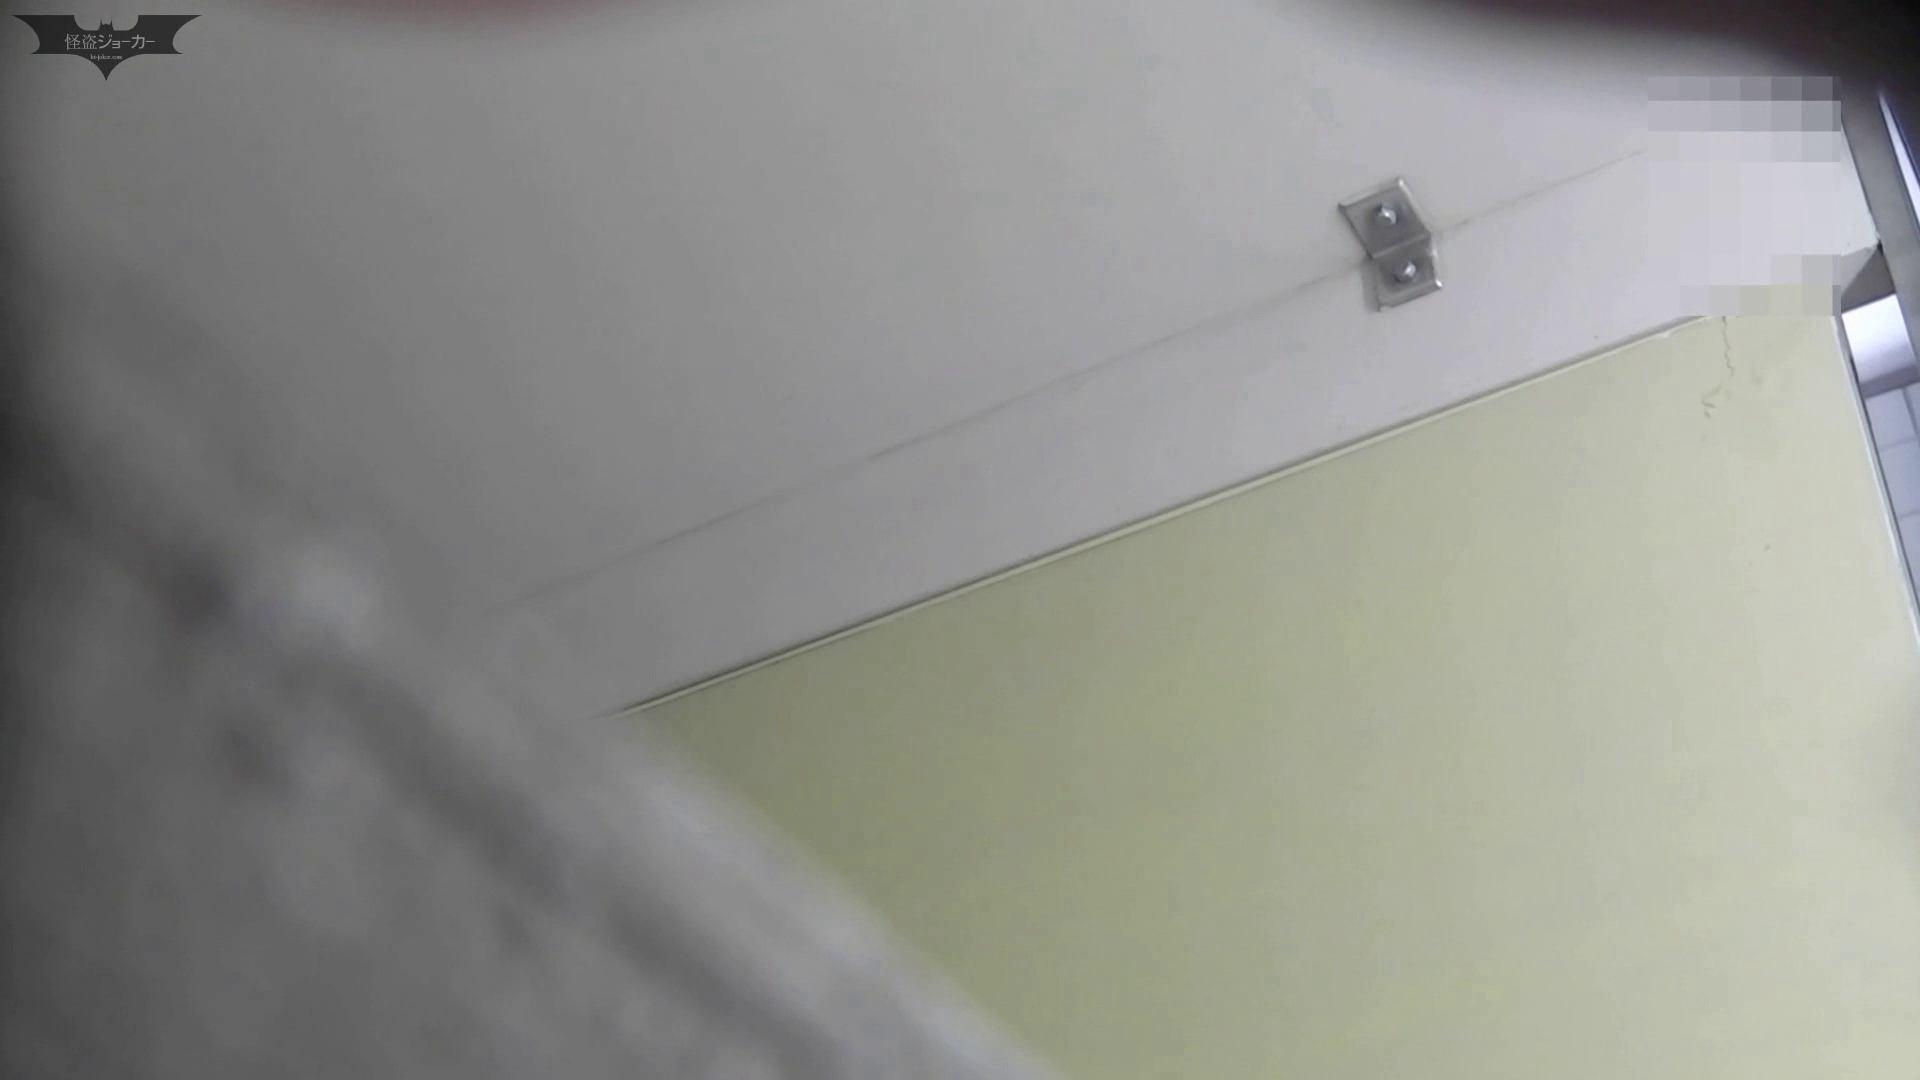 洗面所特攻隊 vol.66 珍事件発生!! 「指」で出【2015・05位】 盛合せ エロ無料画像 80枚 9